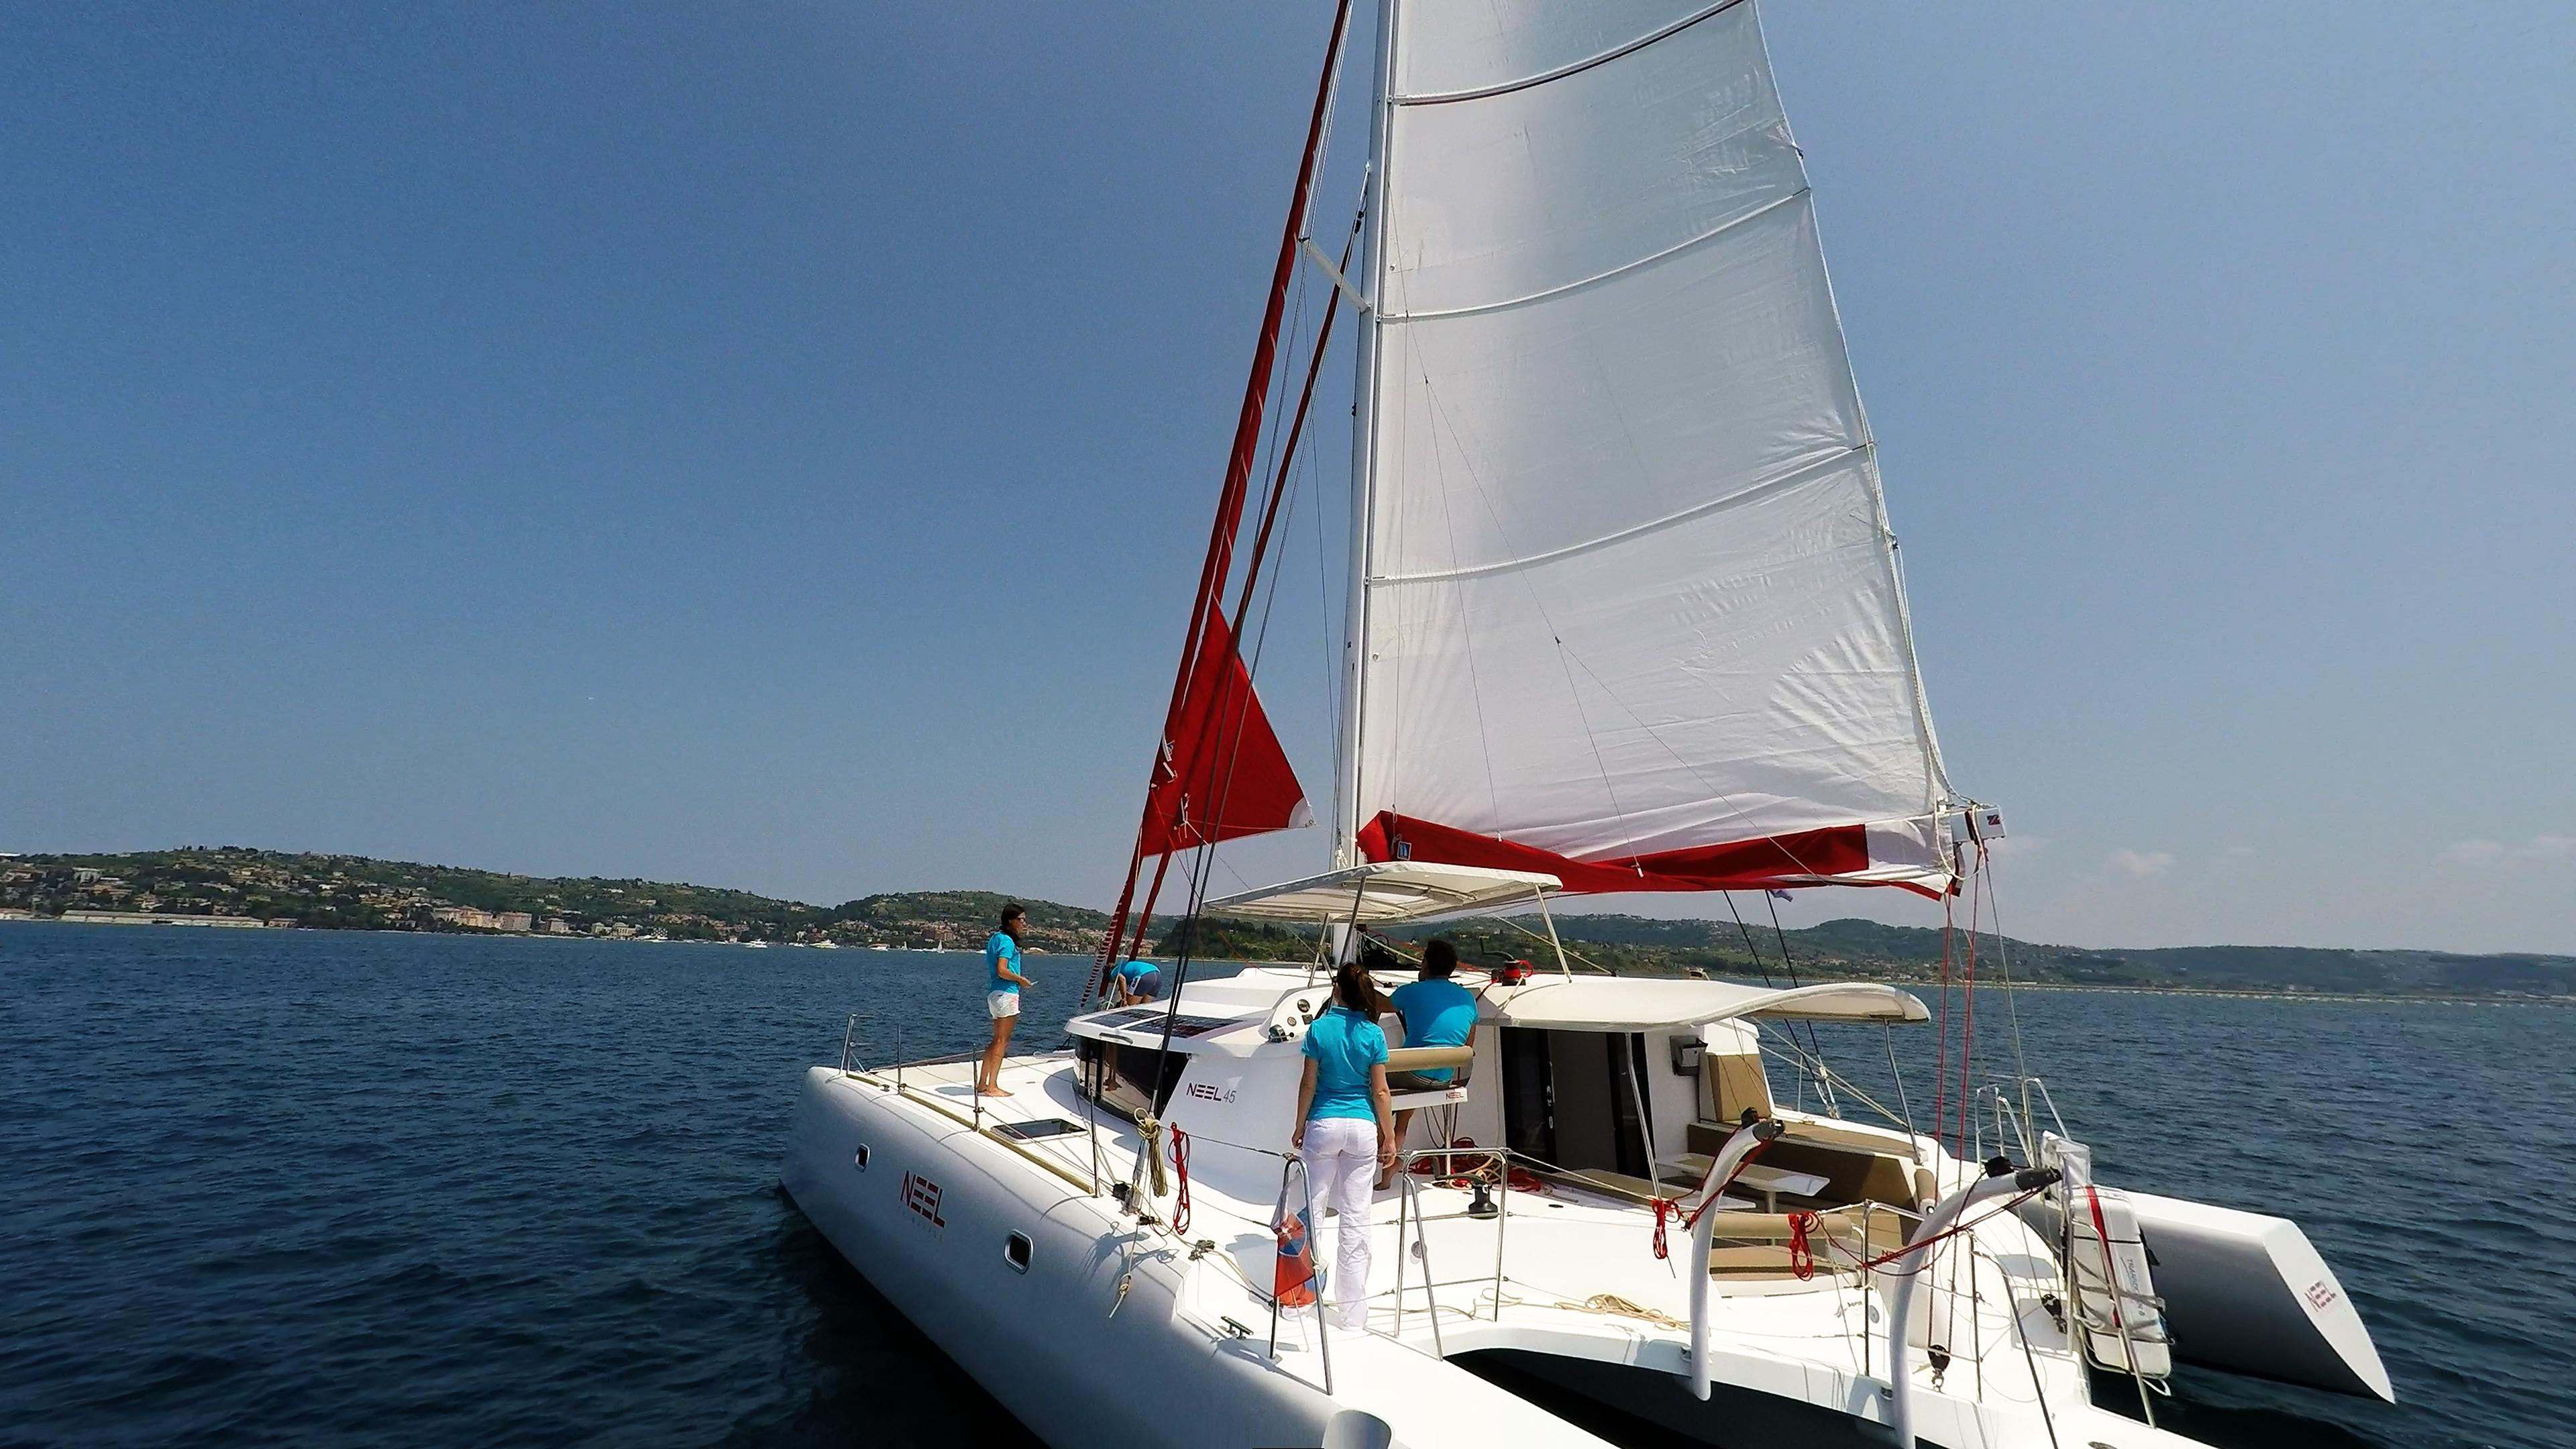 neel 45 trimarano yacht